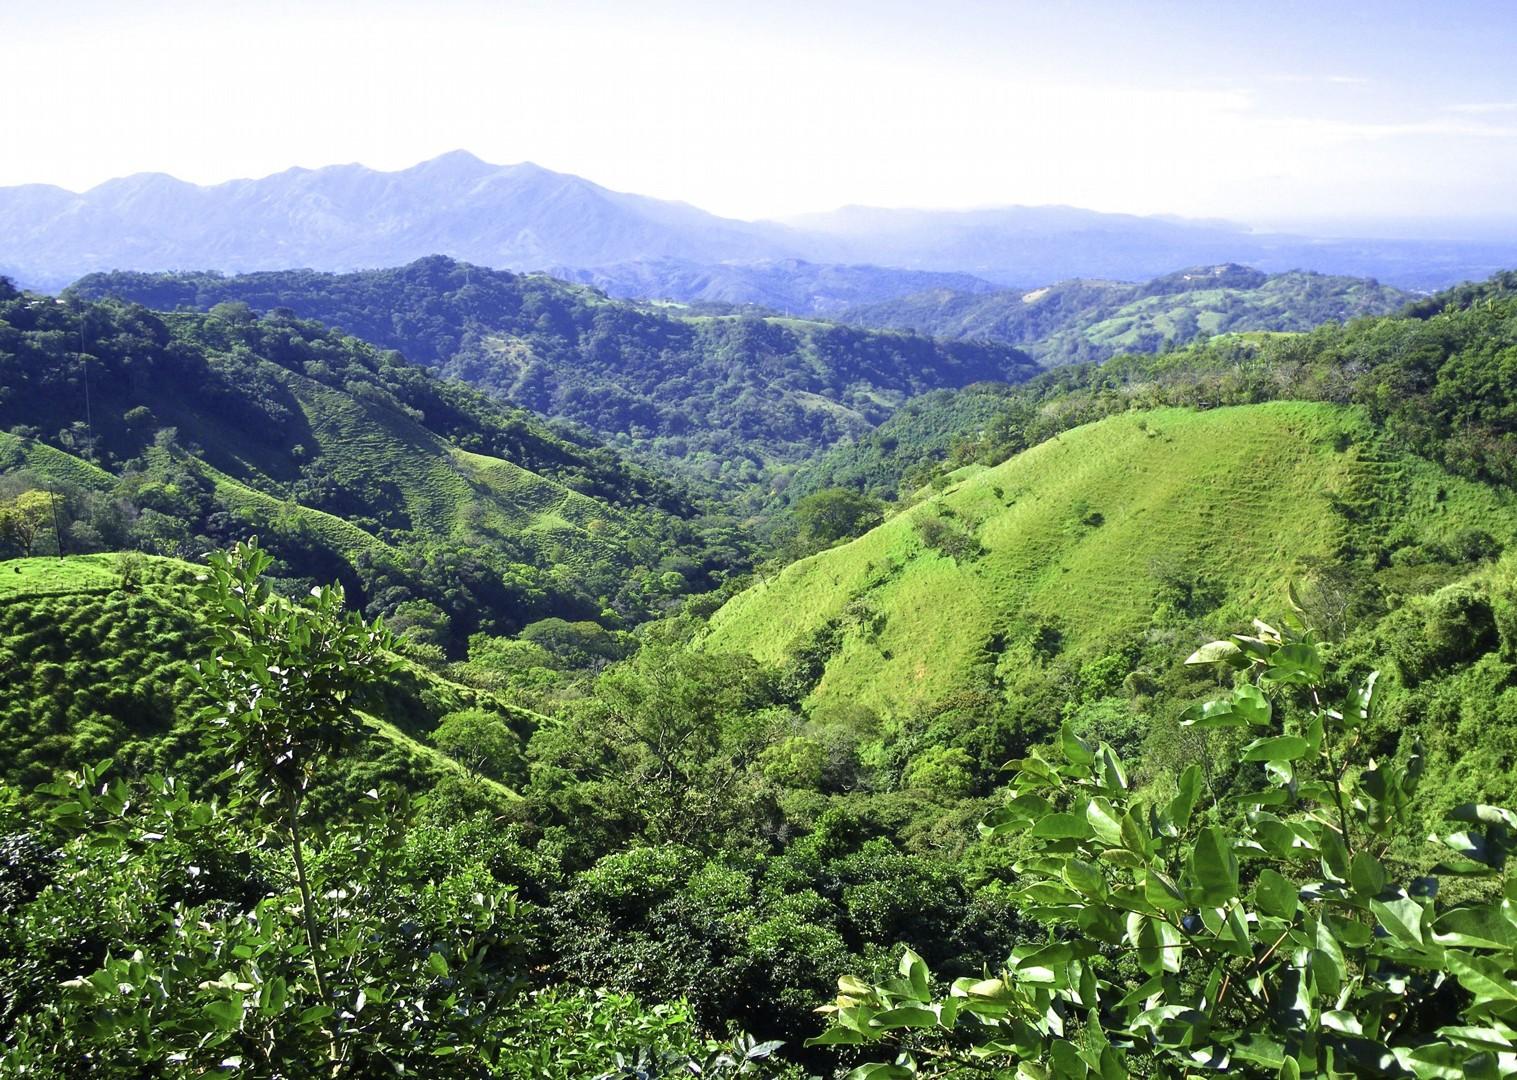 costa-rica-valleys-family-cycling-holiday.jpg - Costa Rica - Volcanoes and Valleys - Family Cycling